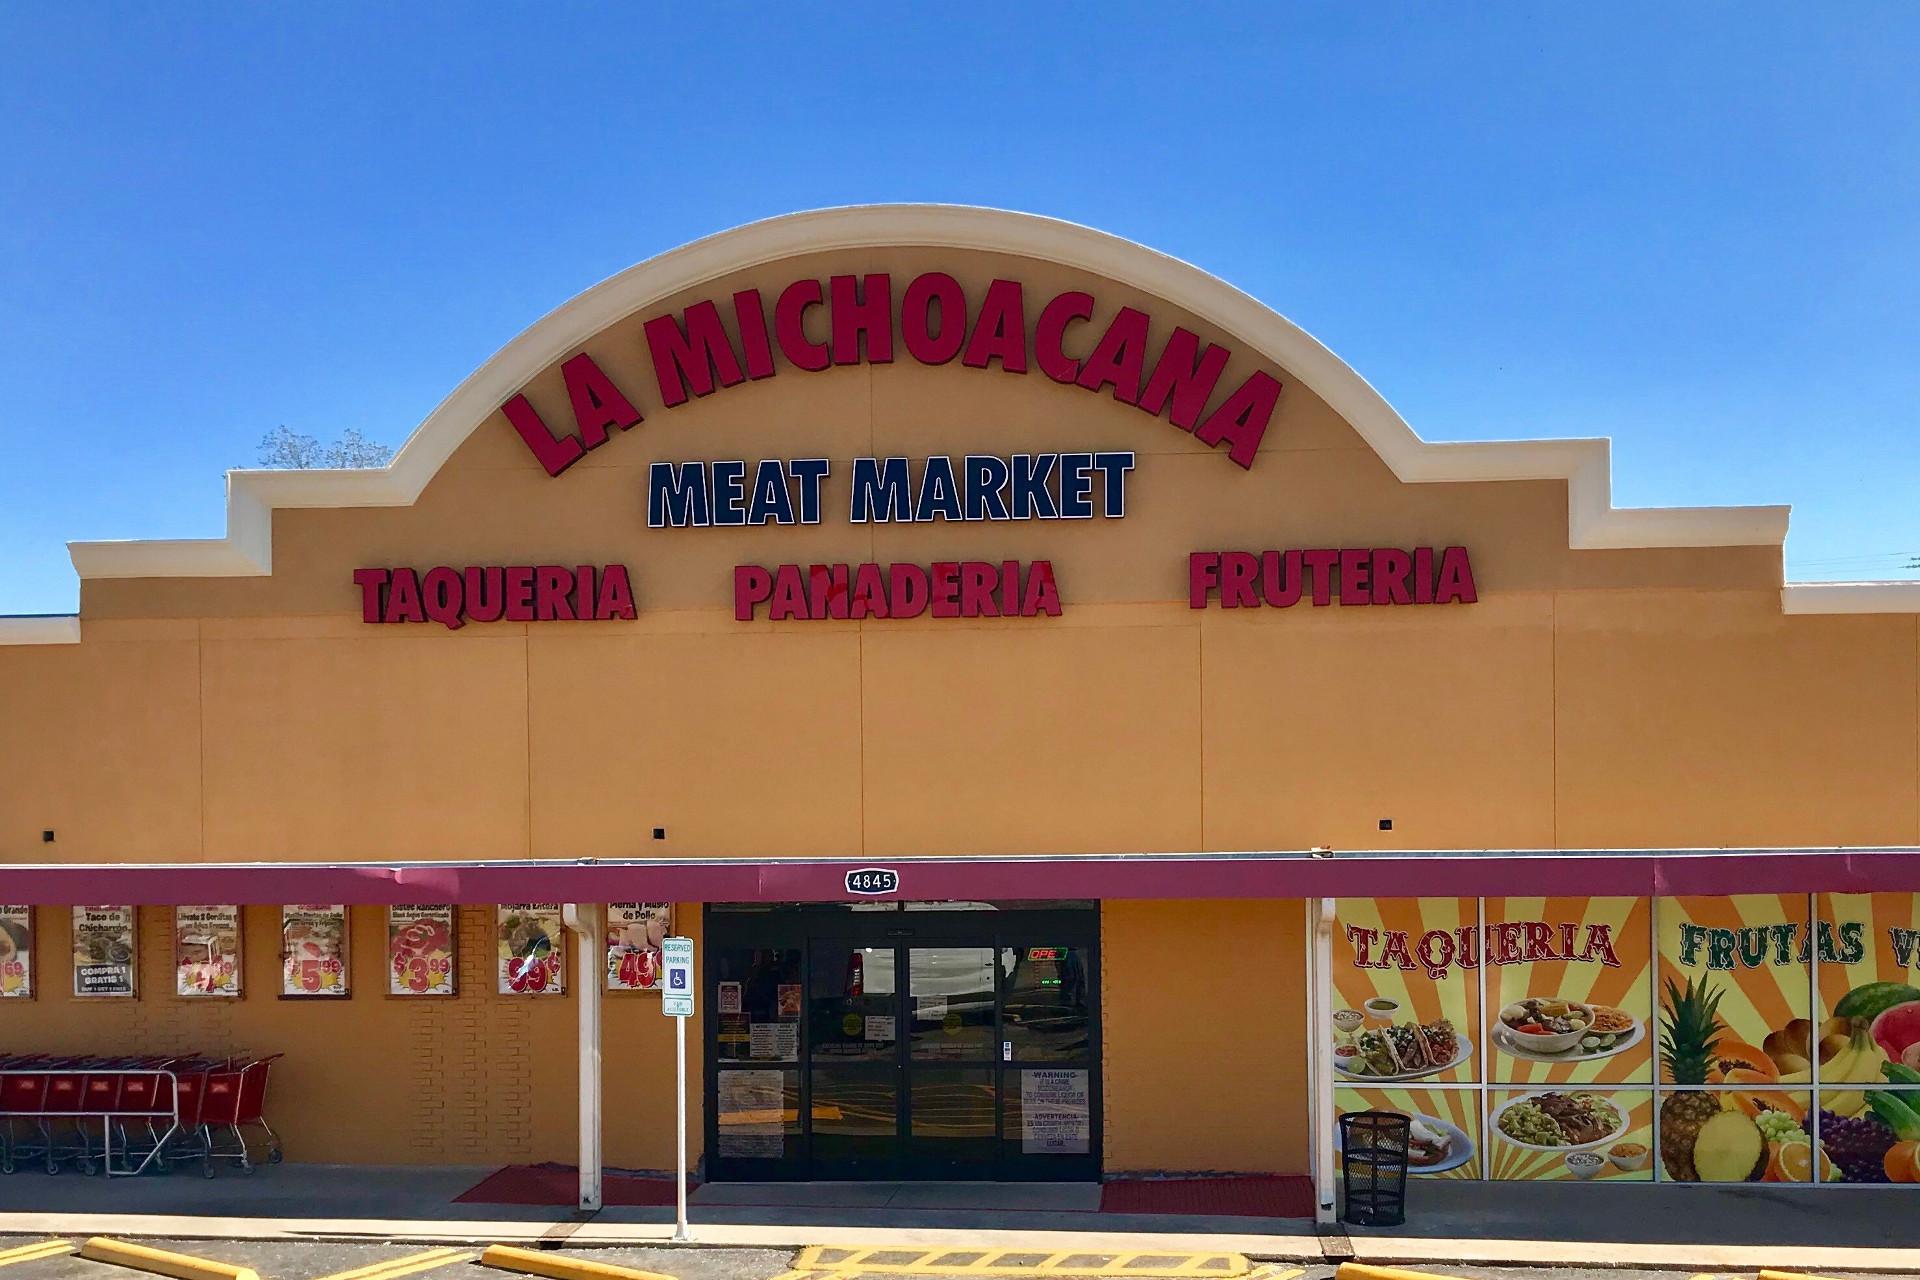 La Michoacana Meat Market - La Michoacana Meat Market